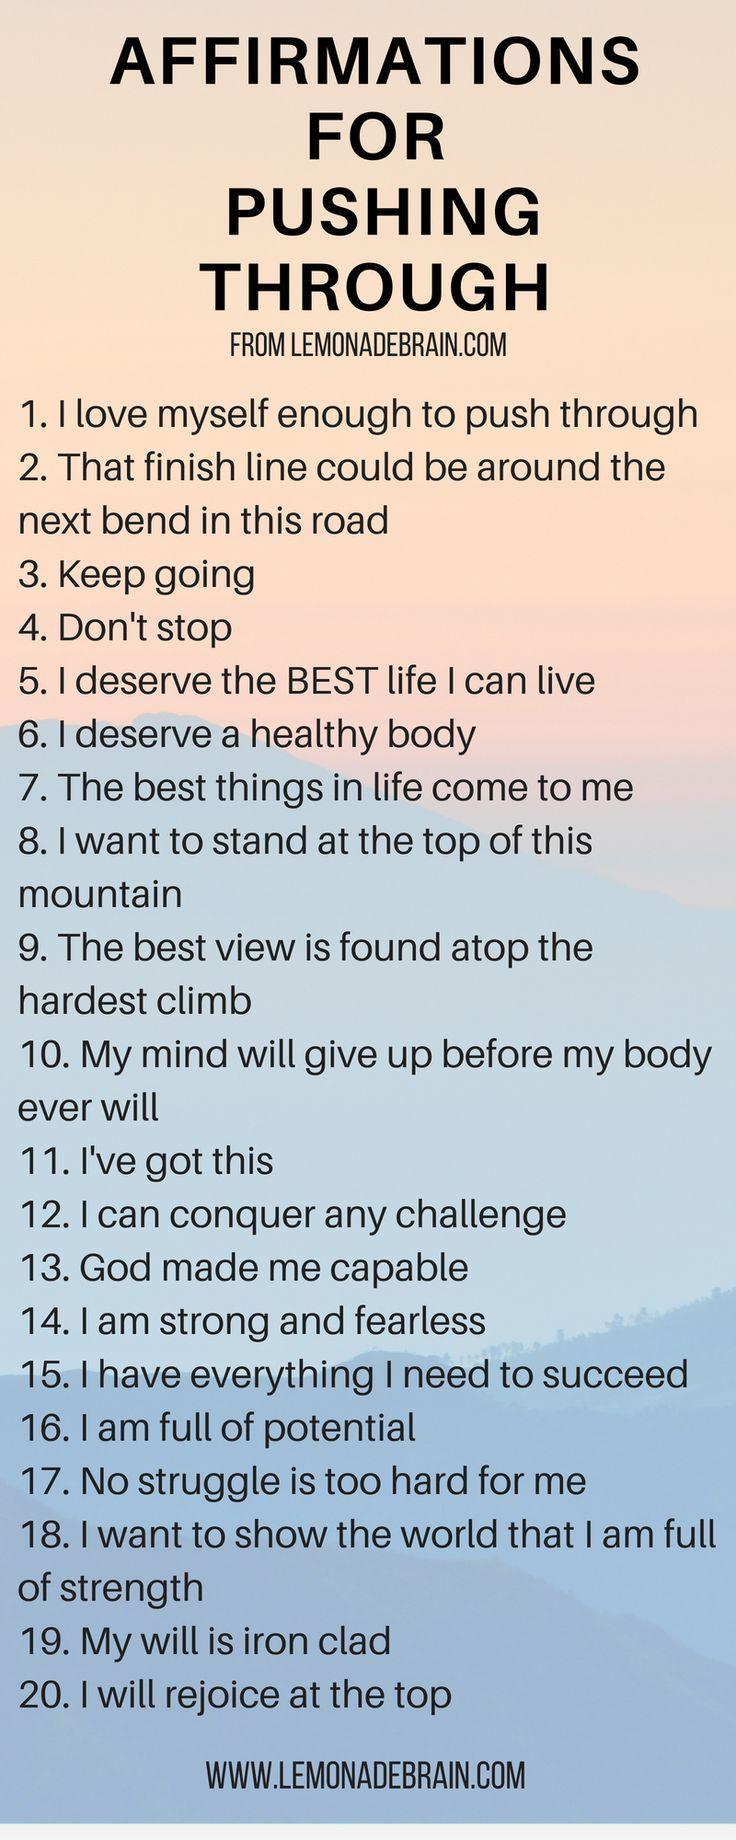 Monday Motivation: Keep Climbing